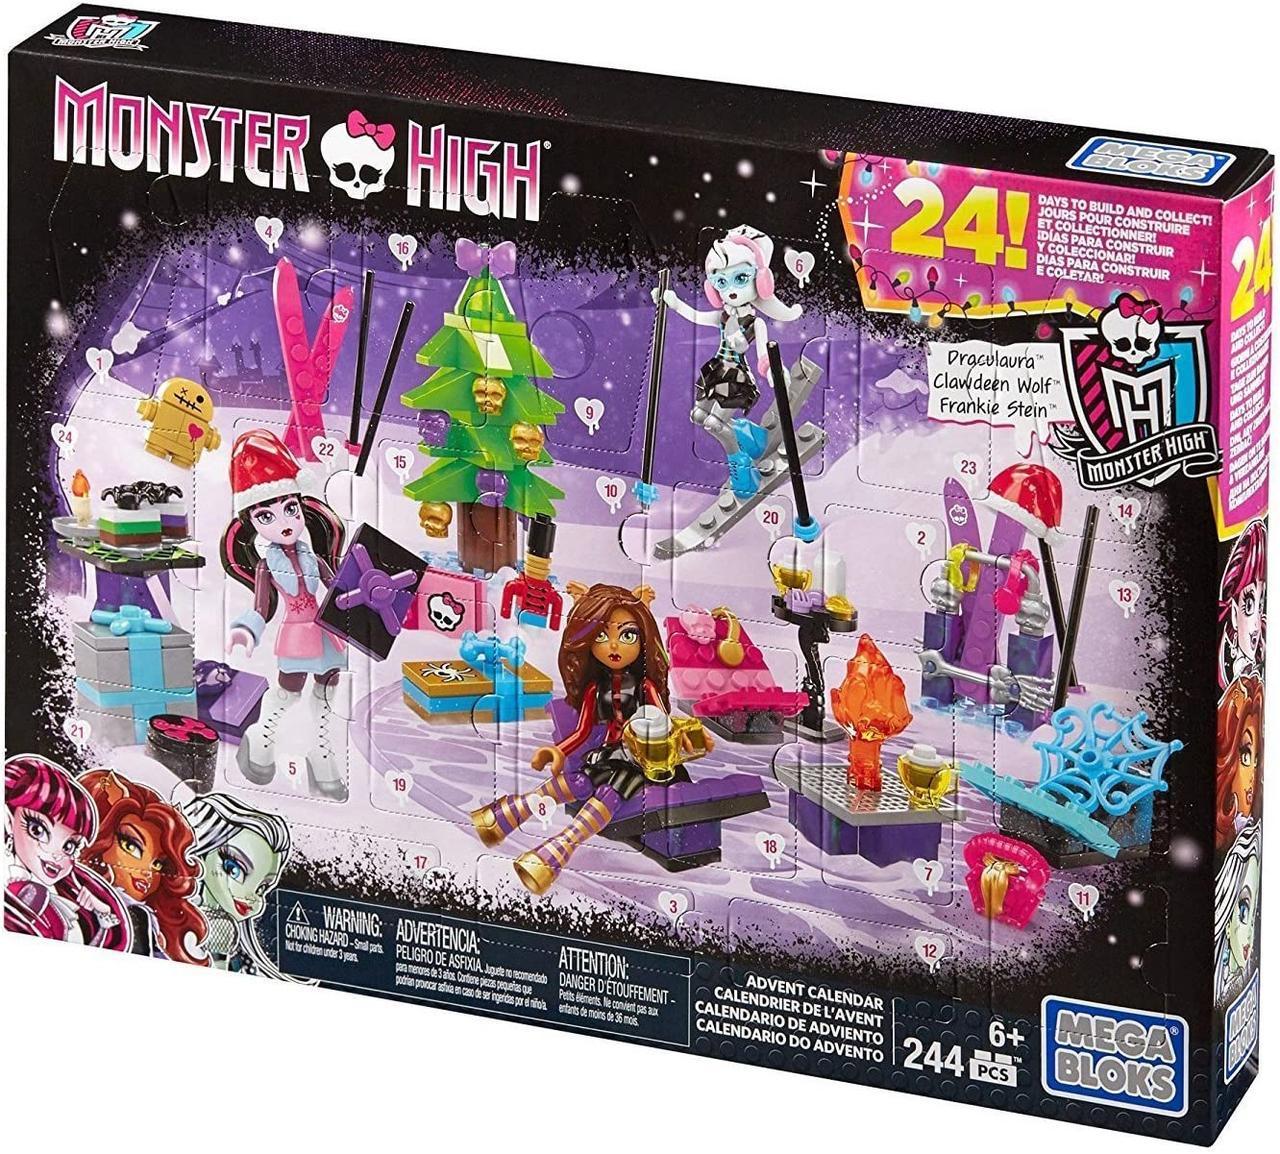 Монстер хай Мега Блокс Адвент-календарь Monster High Mega Bloks  Advent Calendar DPK33